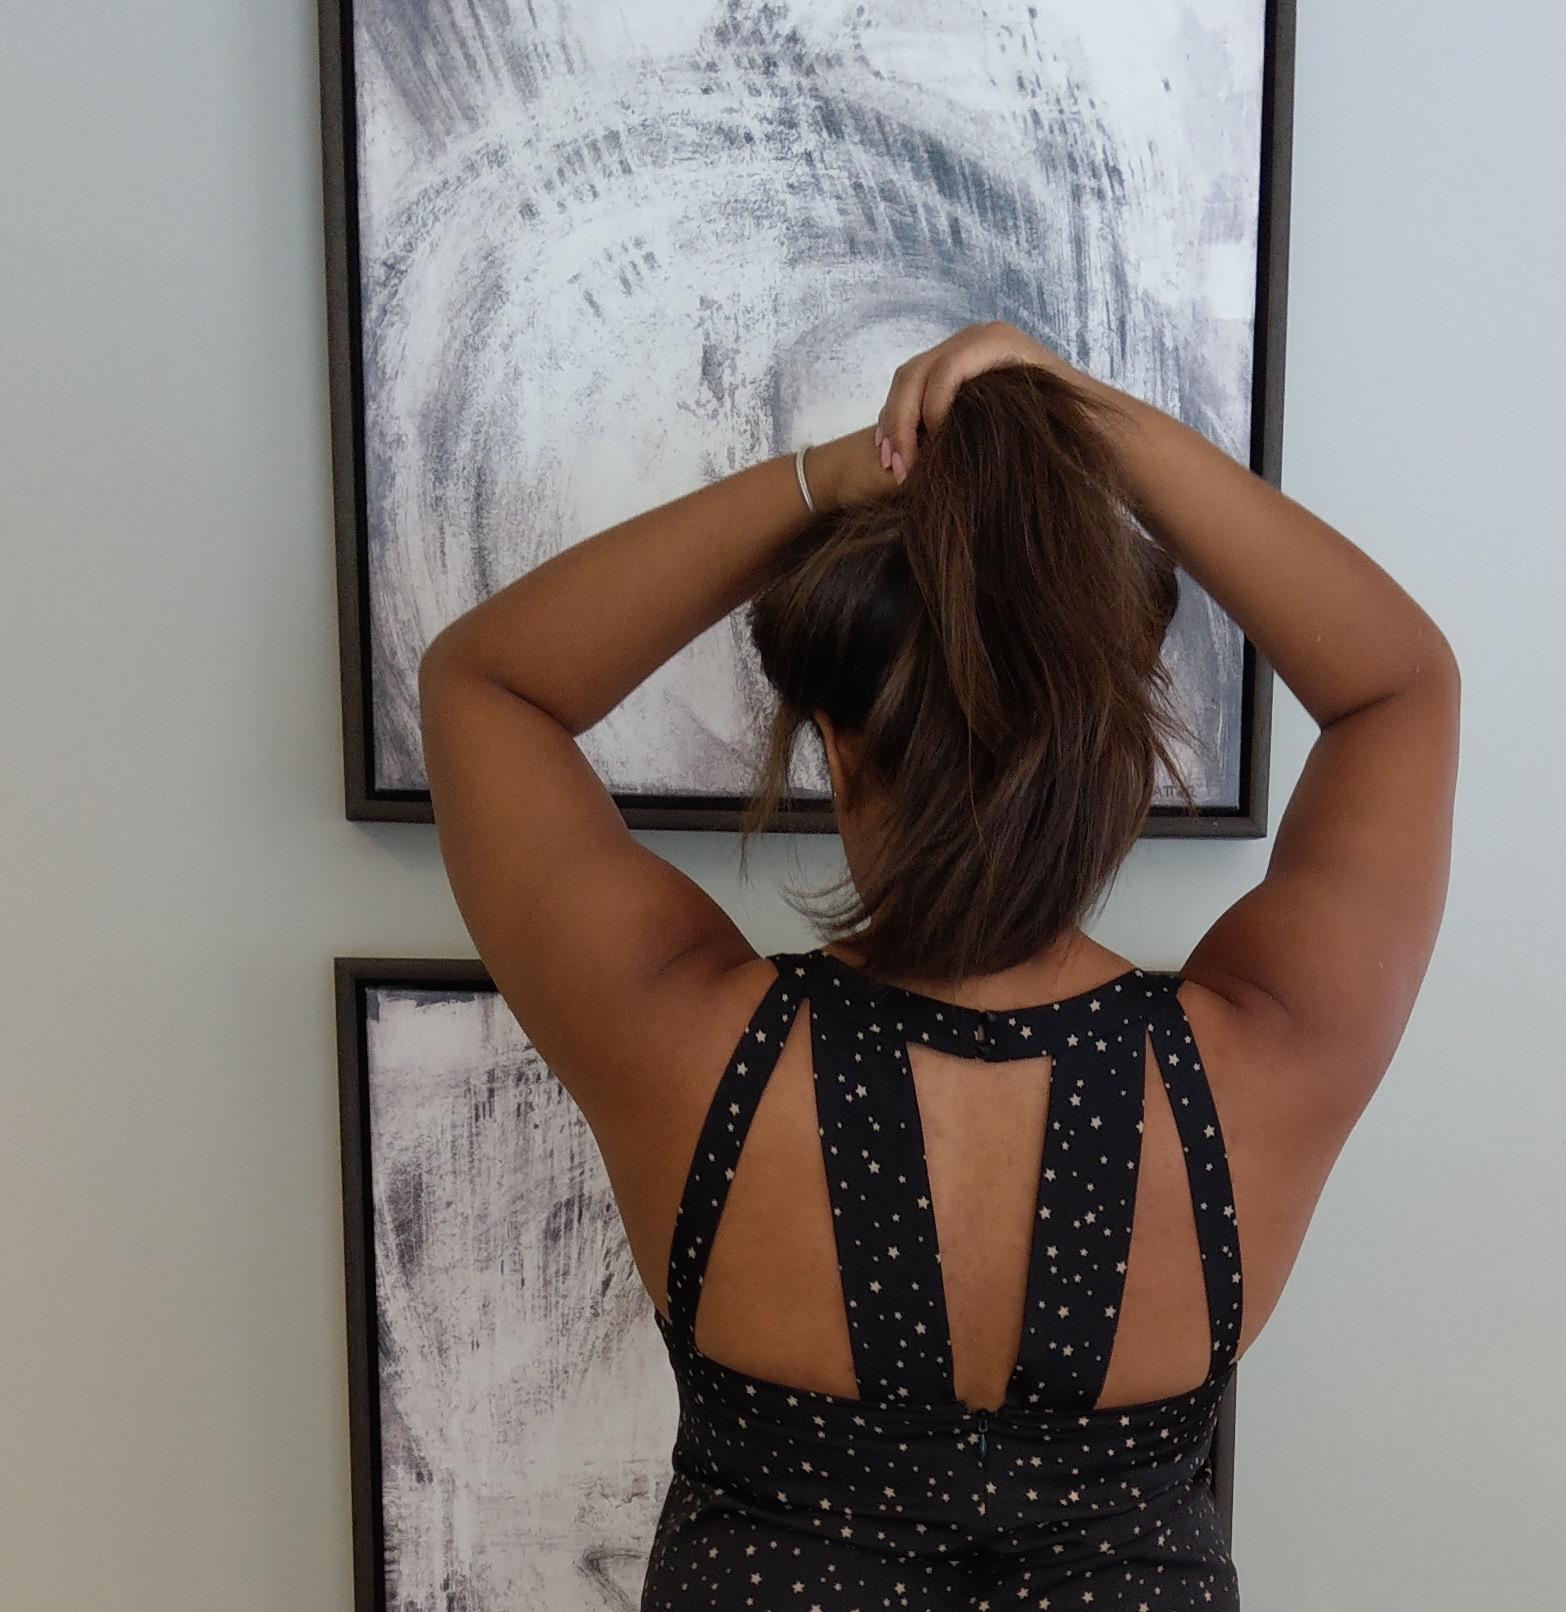 Keri Elaine BCBG Back details on black jumpsuit modern wall art and a ponytail